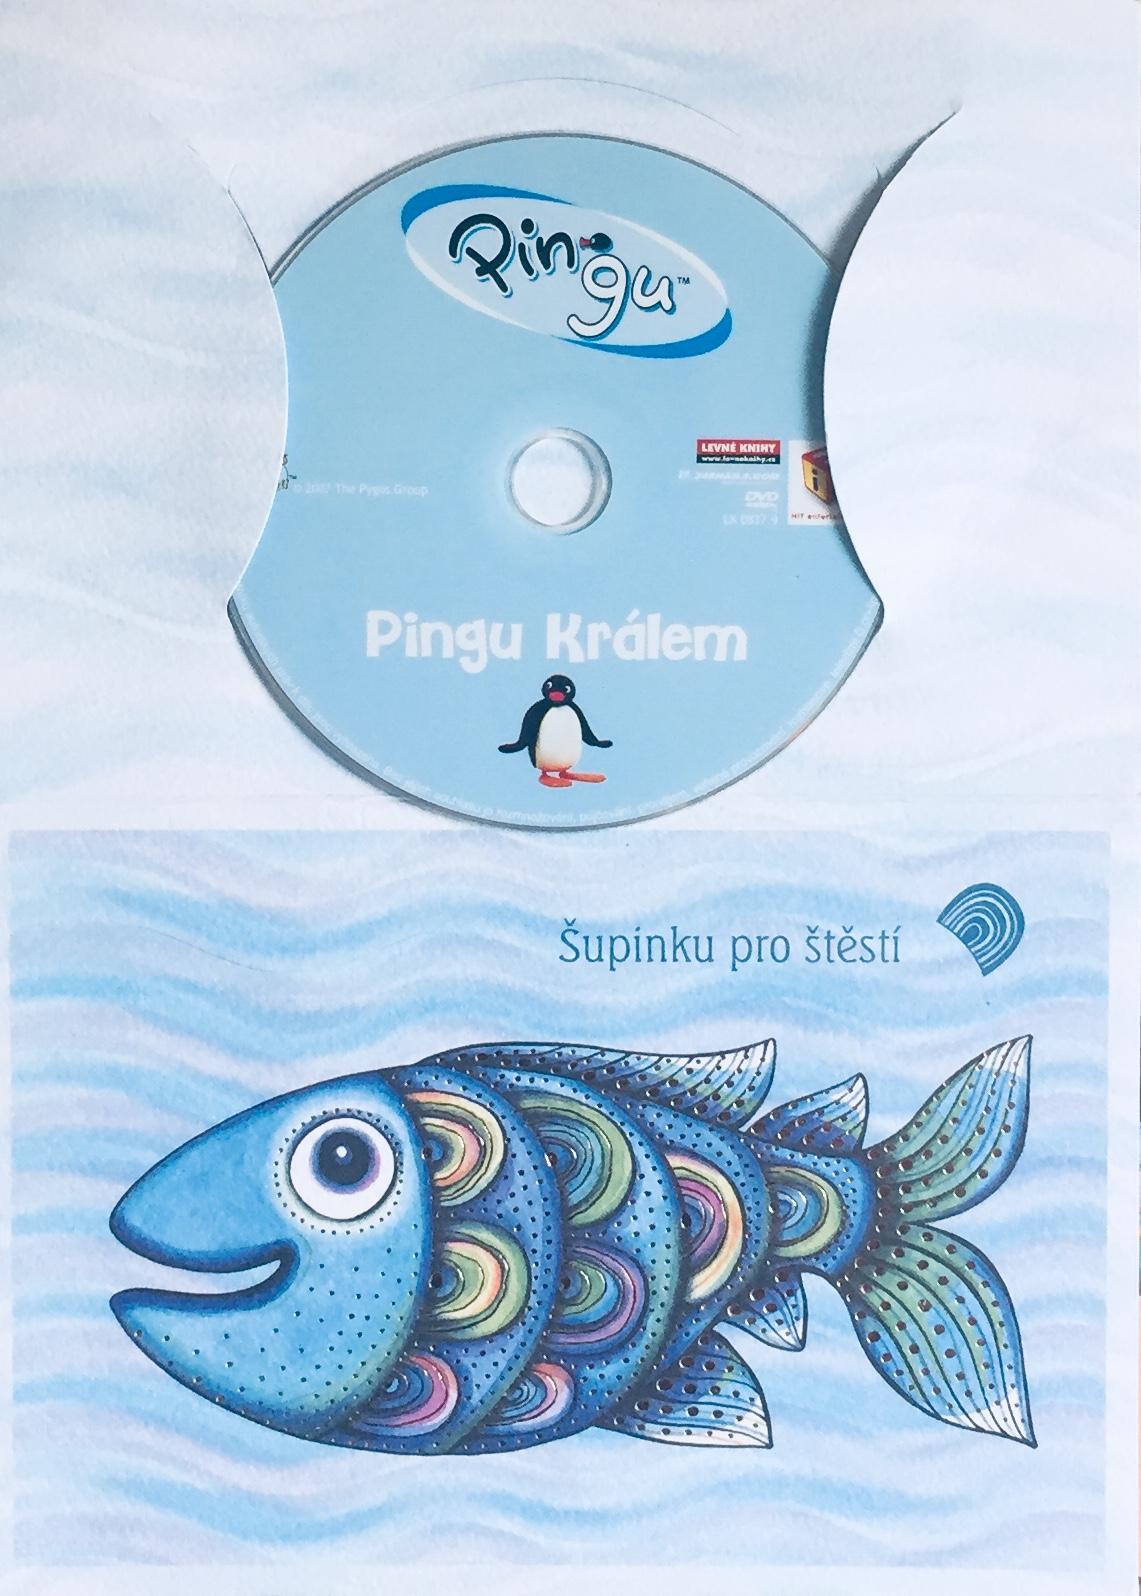 Pingu - Pingu králem - DVD /dárkový obal/